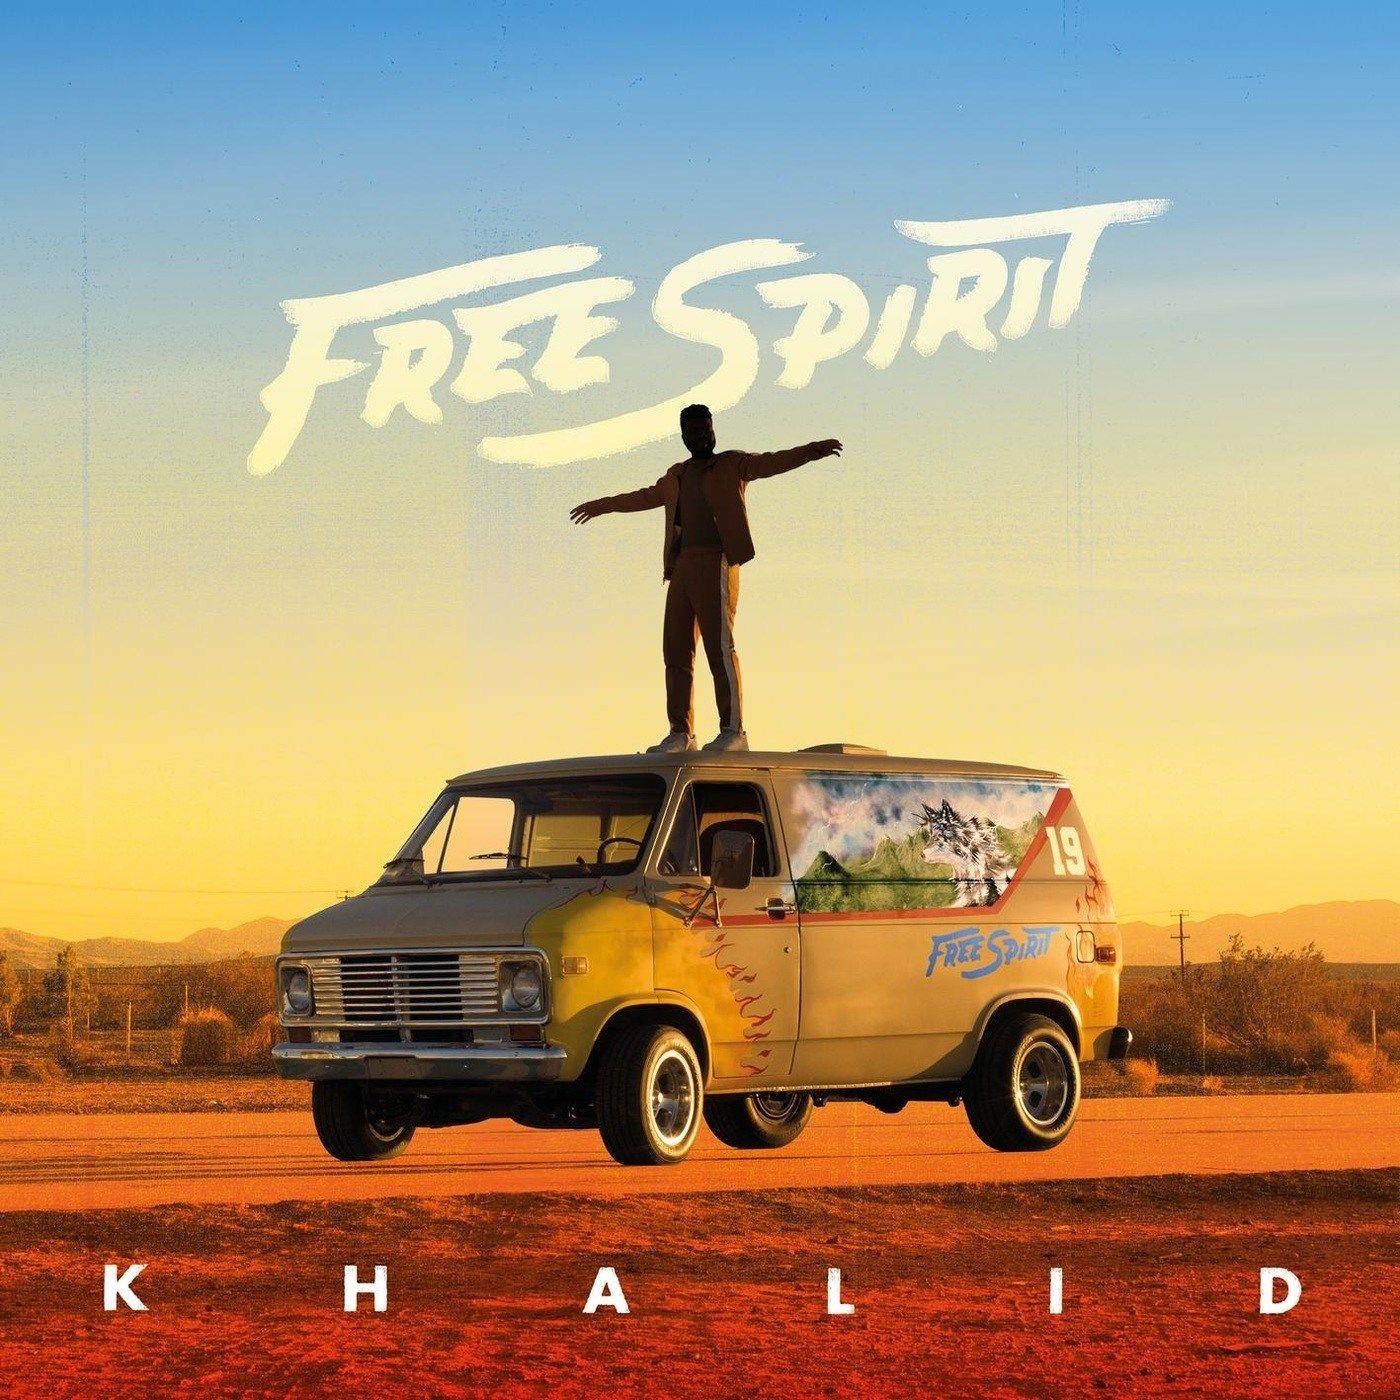 Khalid Free Spirit Album Download (ZIP file) | MUSIC in 2019